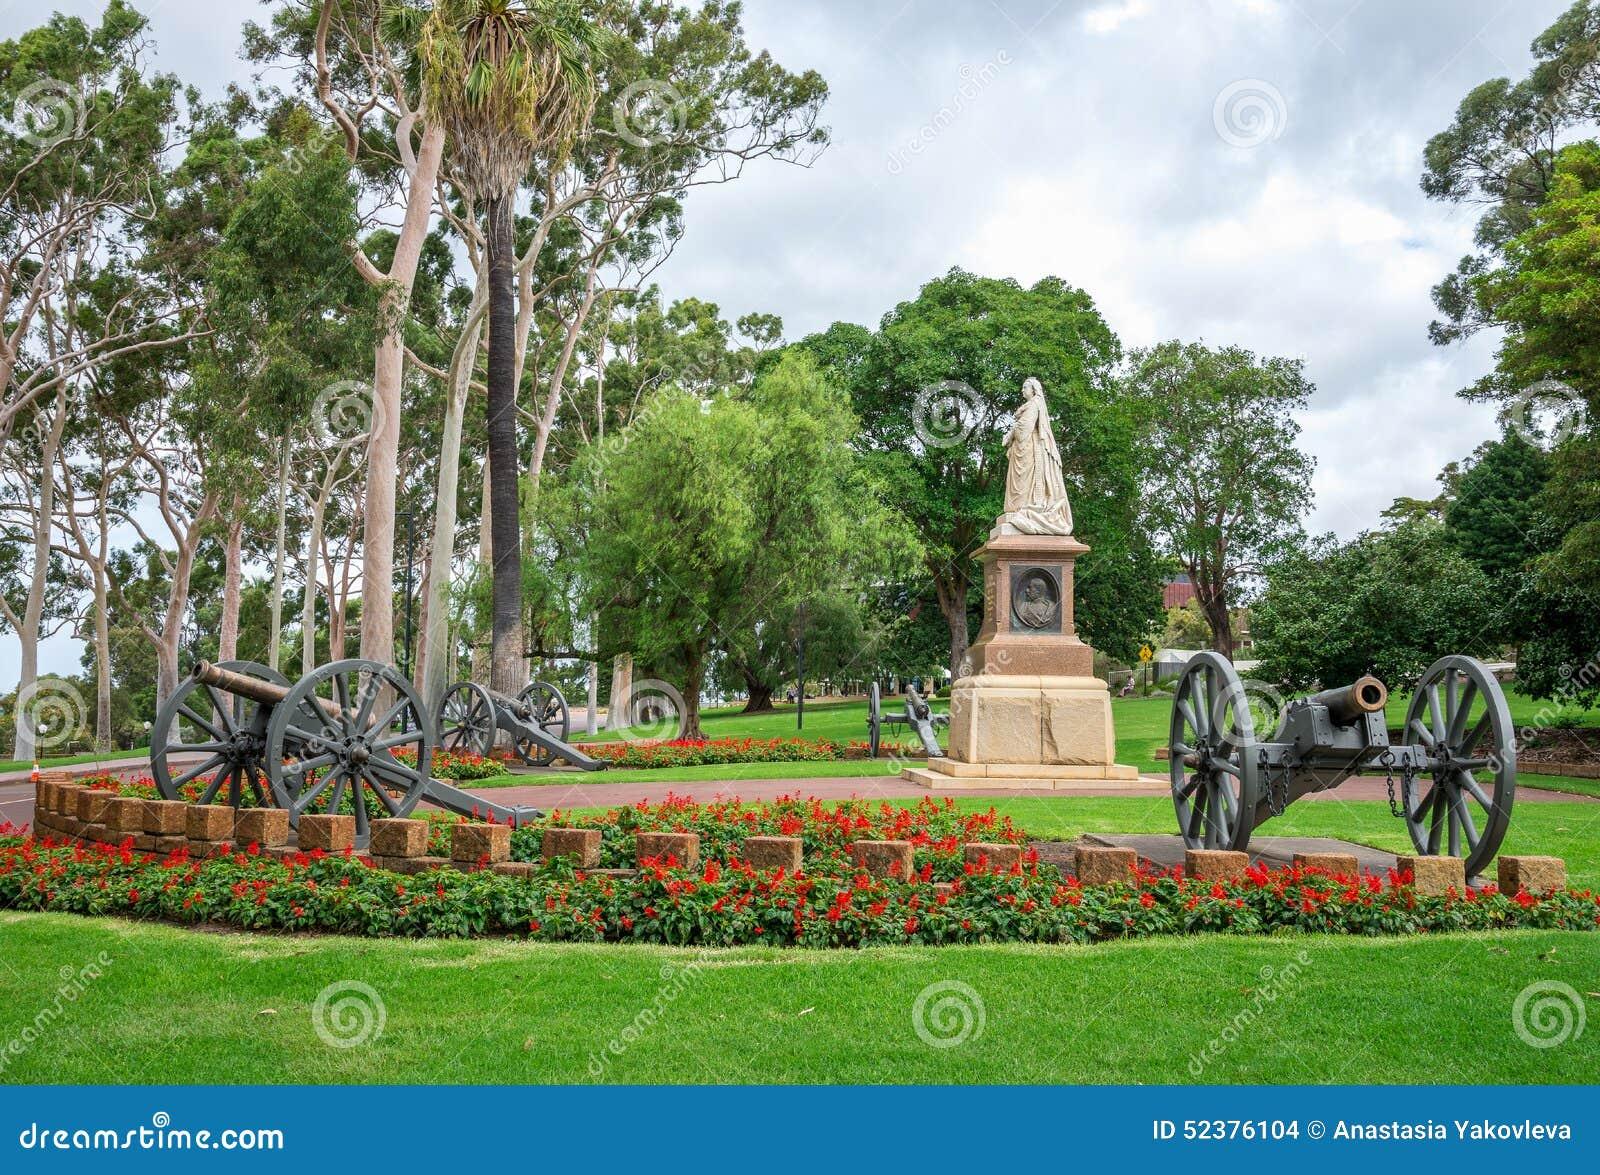 Perth Botanic Gardens Park And Botanic Garden Perth  : statue queen victoria kings park botanical gardens i perth western australia 52376104 from sherlockdesigner.com size 1300 x 972 jpeg 341kB